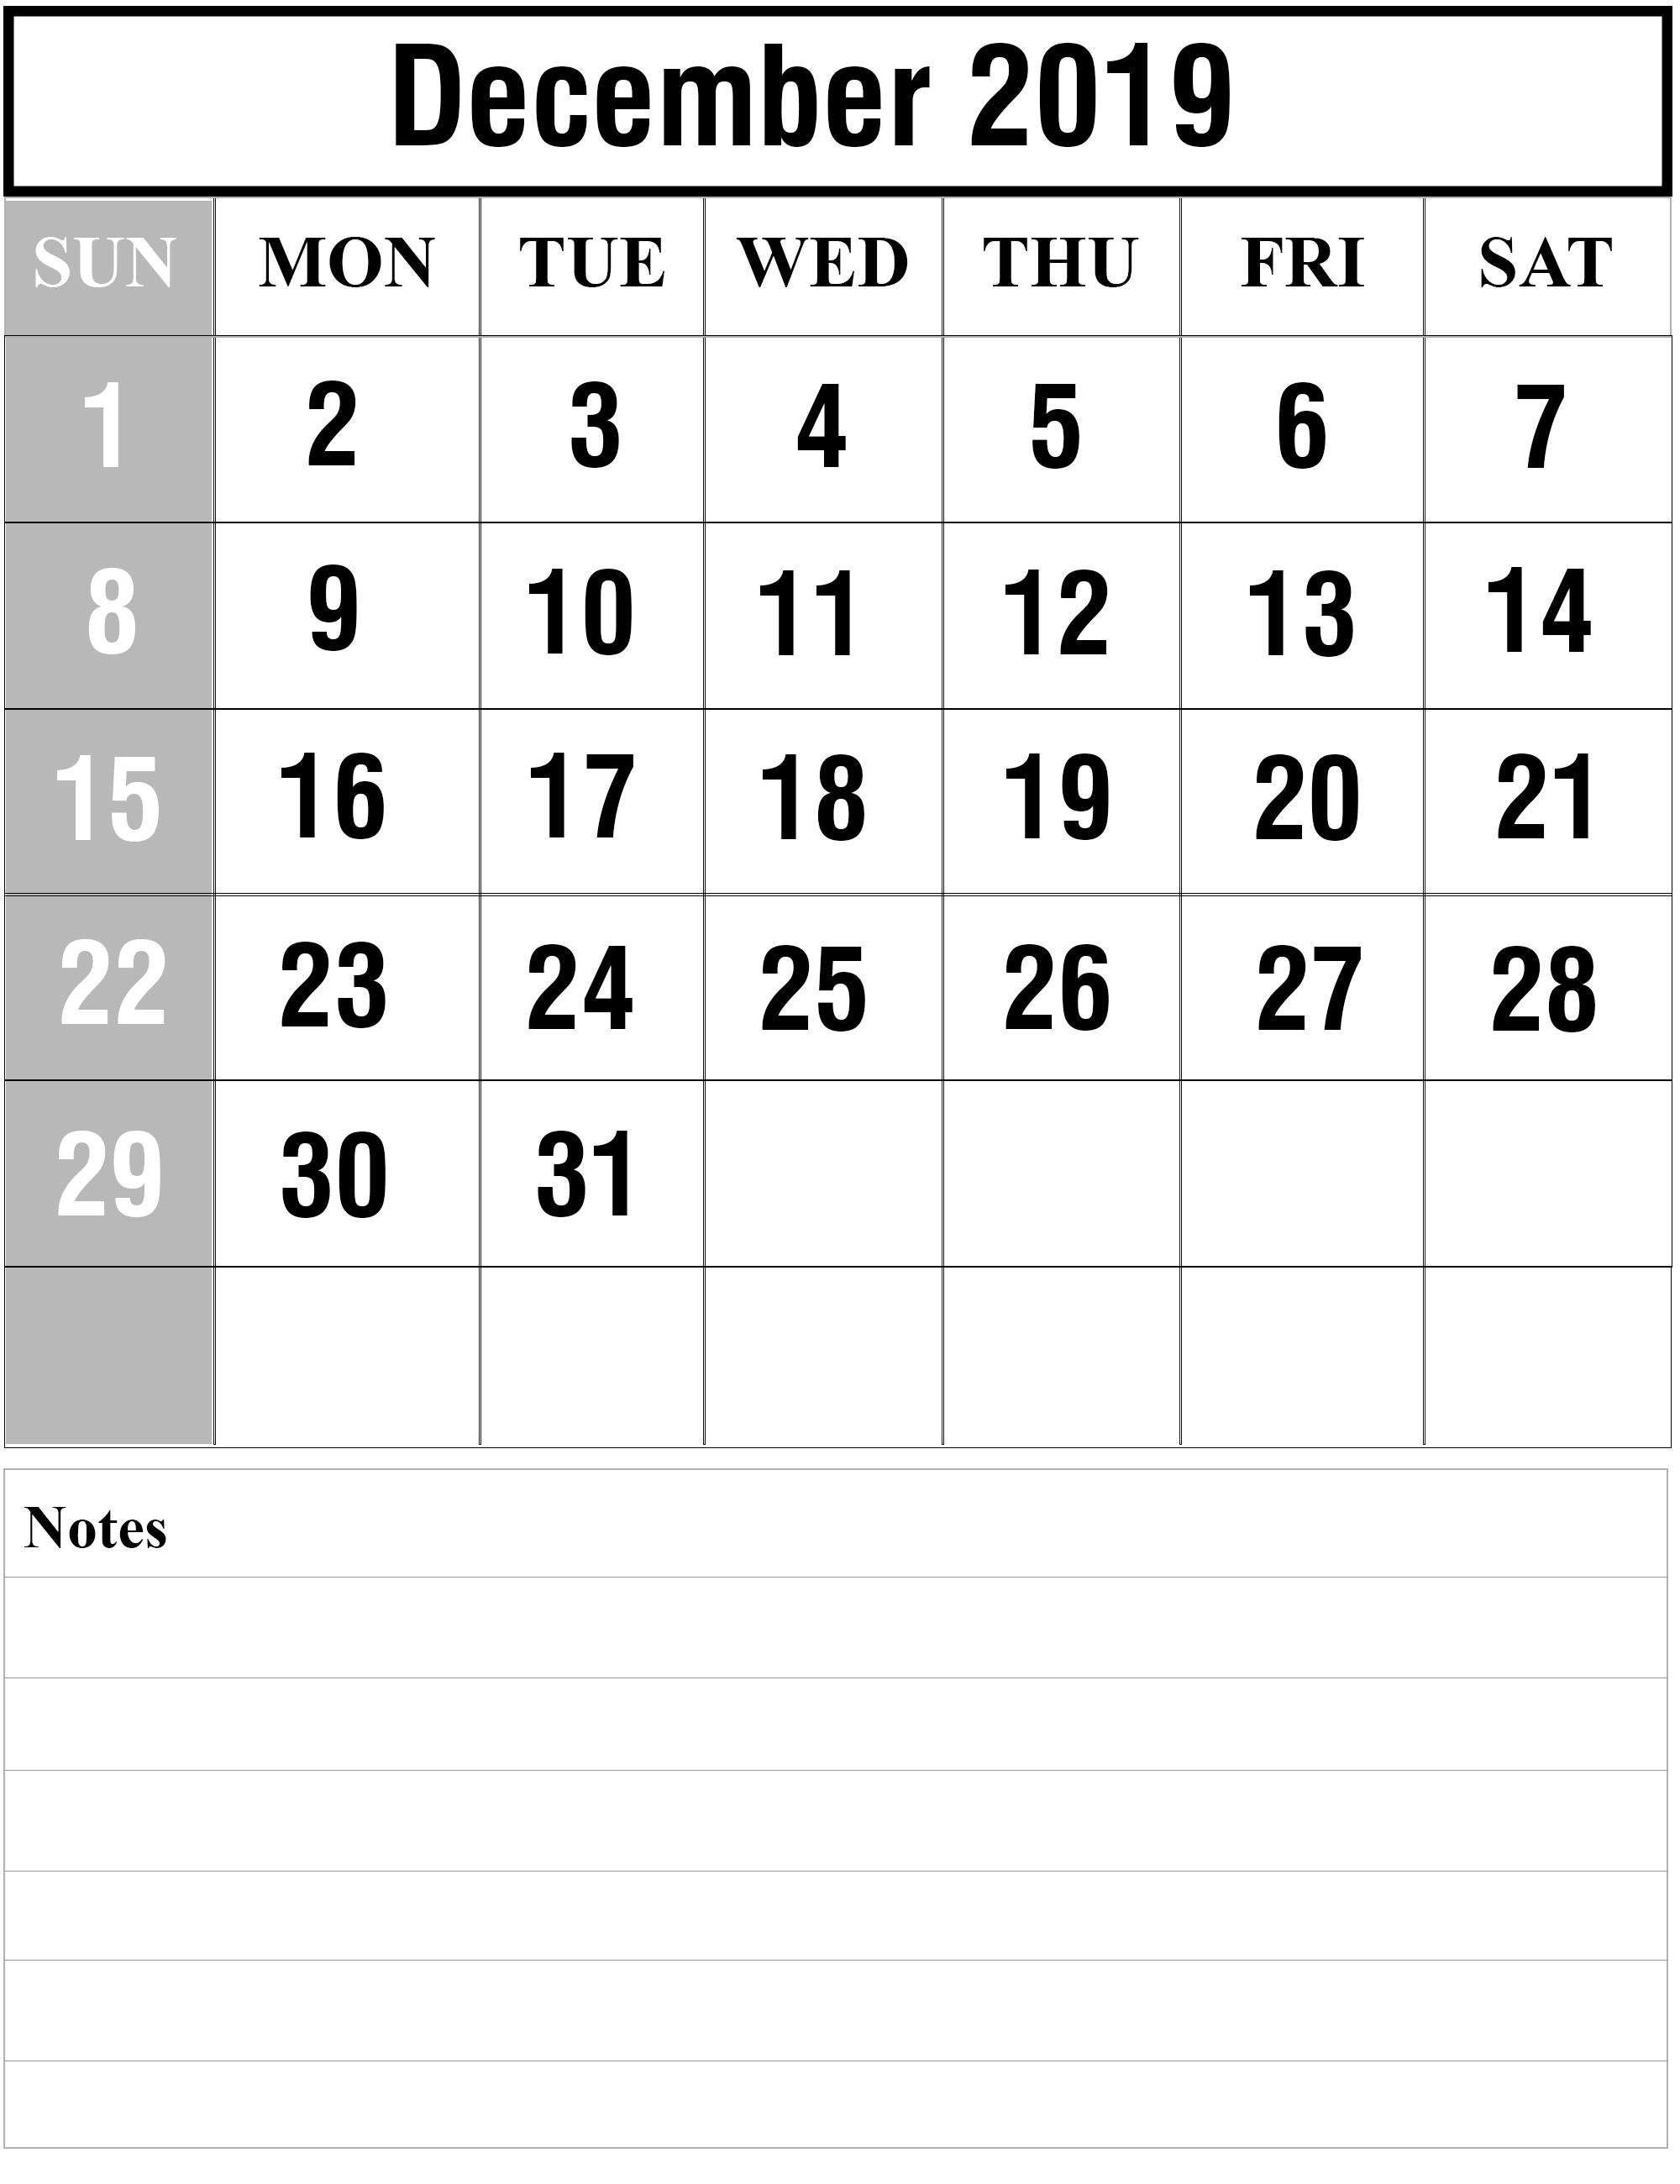 December 2019 Calendar Portrait